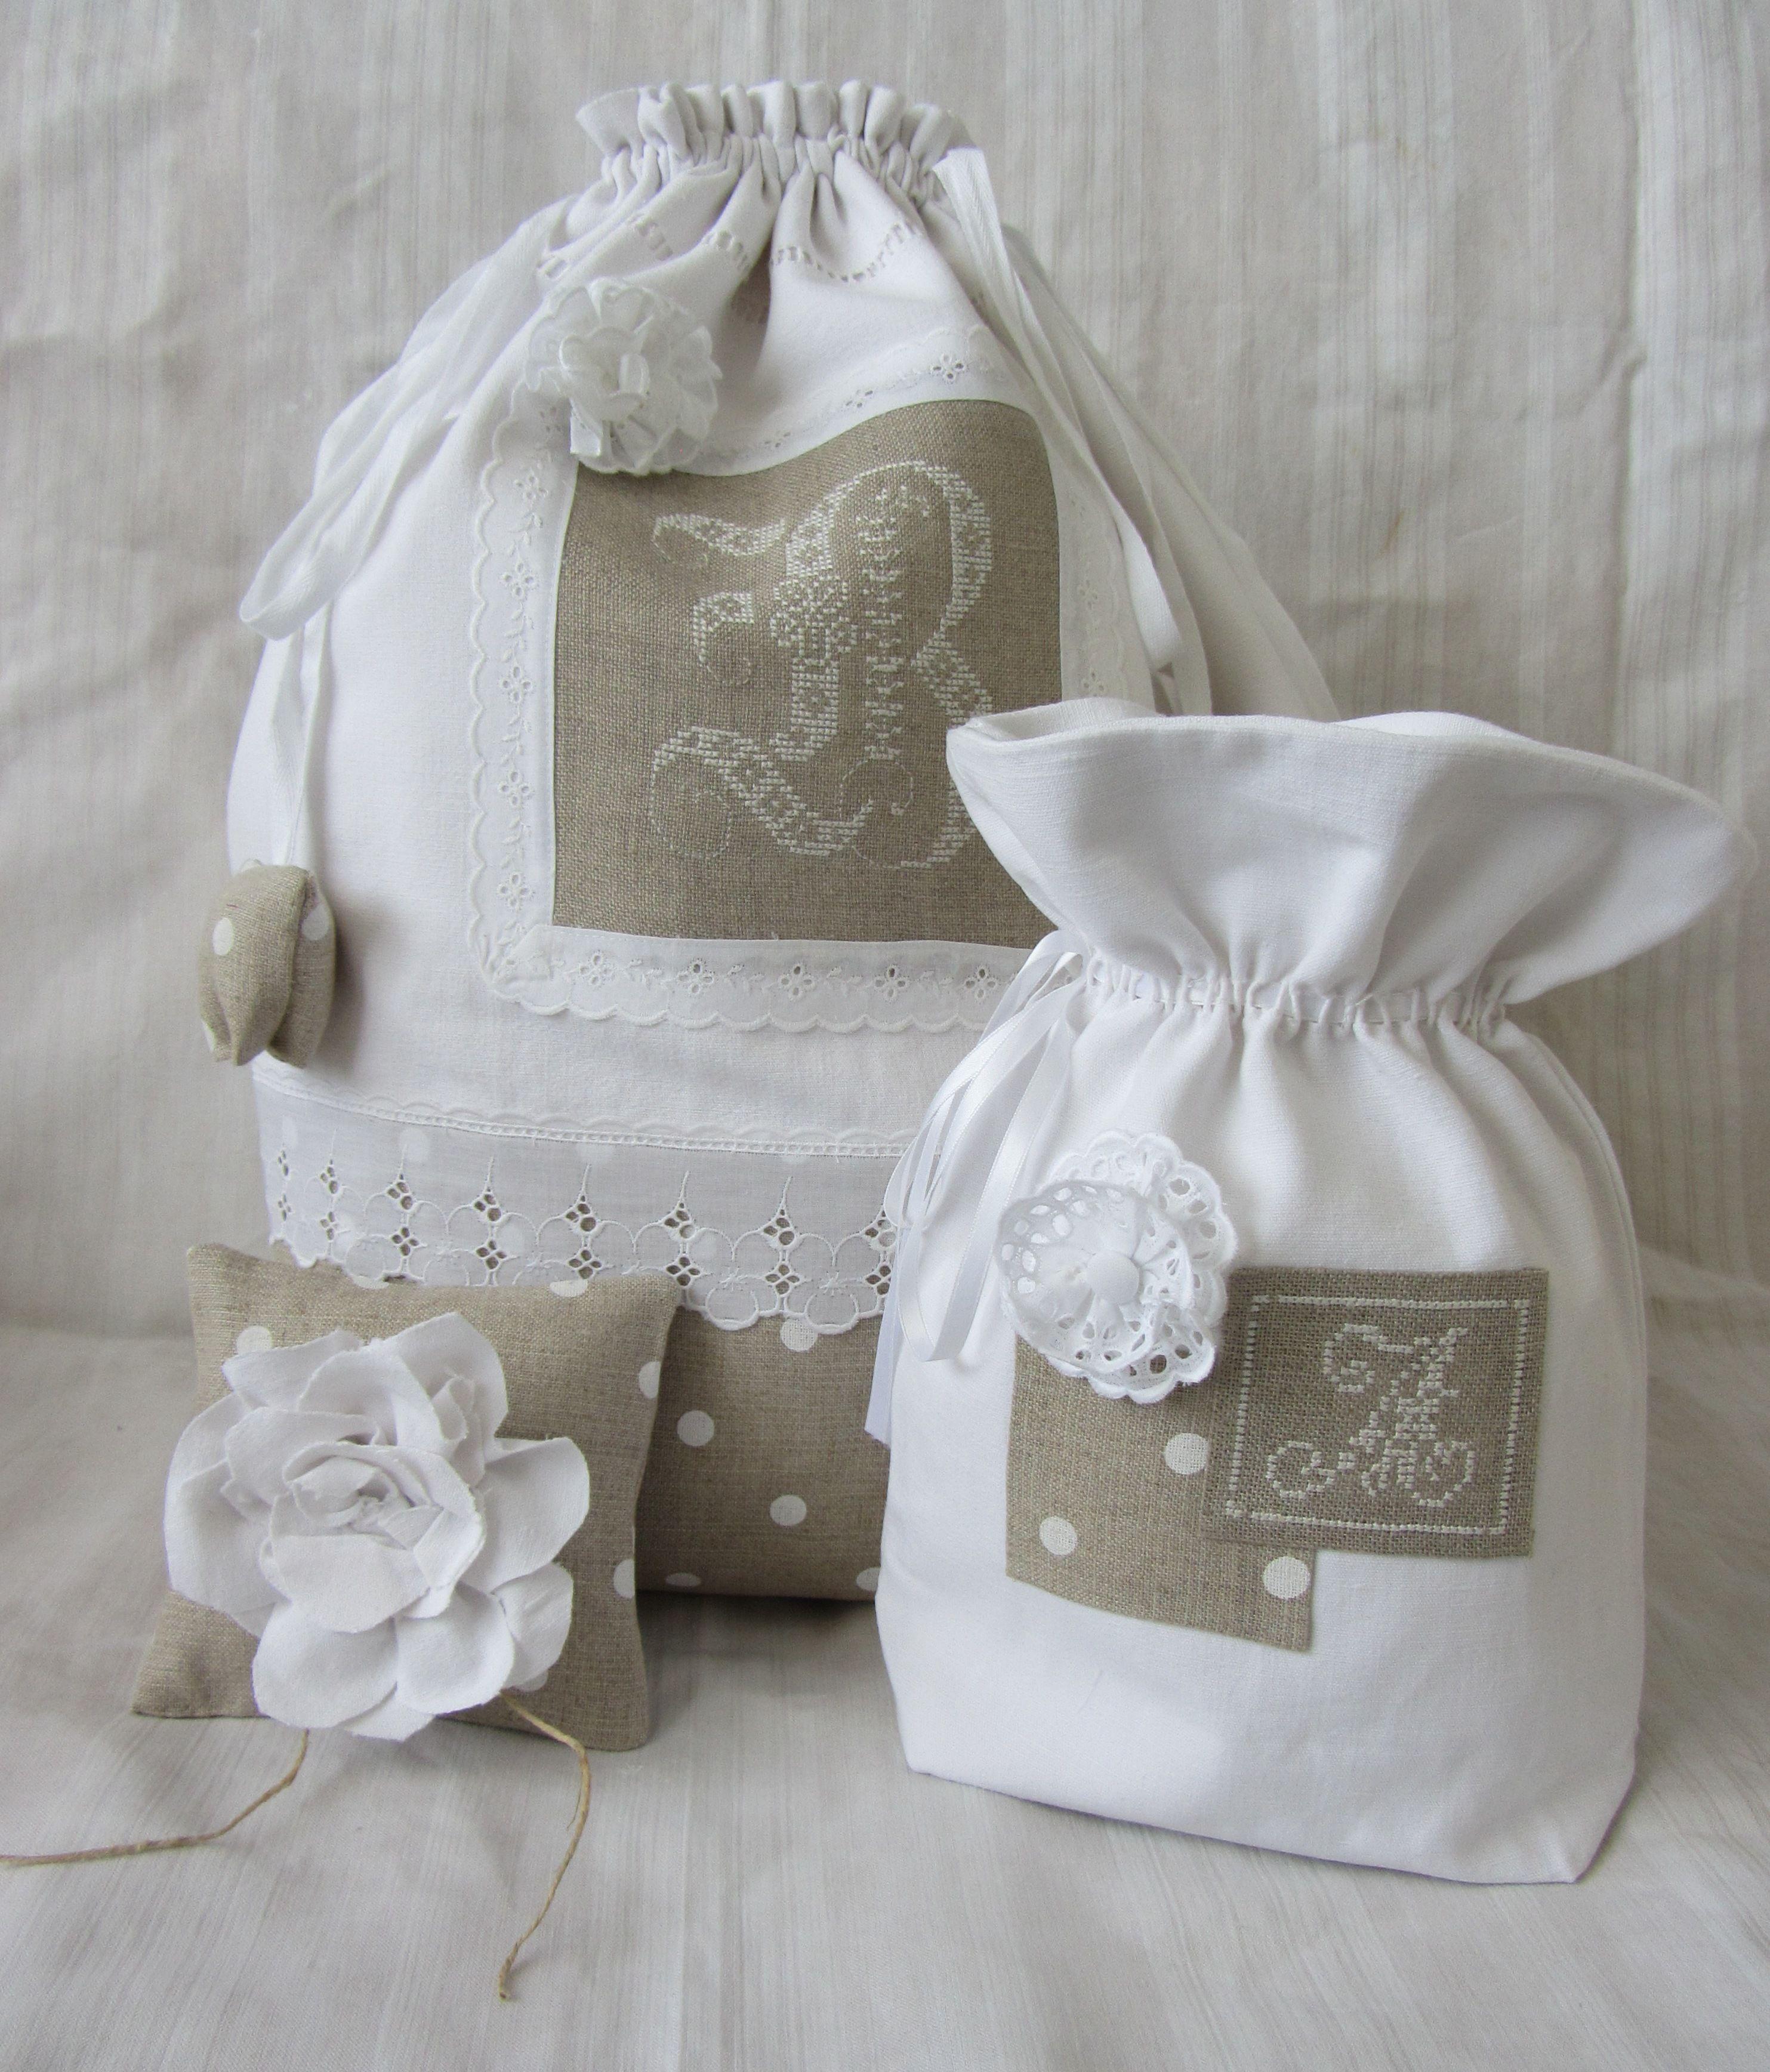 sac linge et pochon bags sac cordon couture sac y. Black Bedroom Furniture Sets. Home Design Ideas